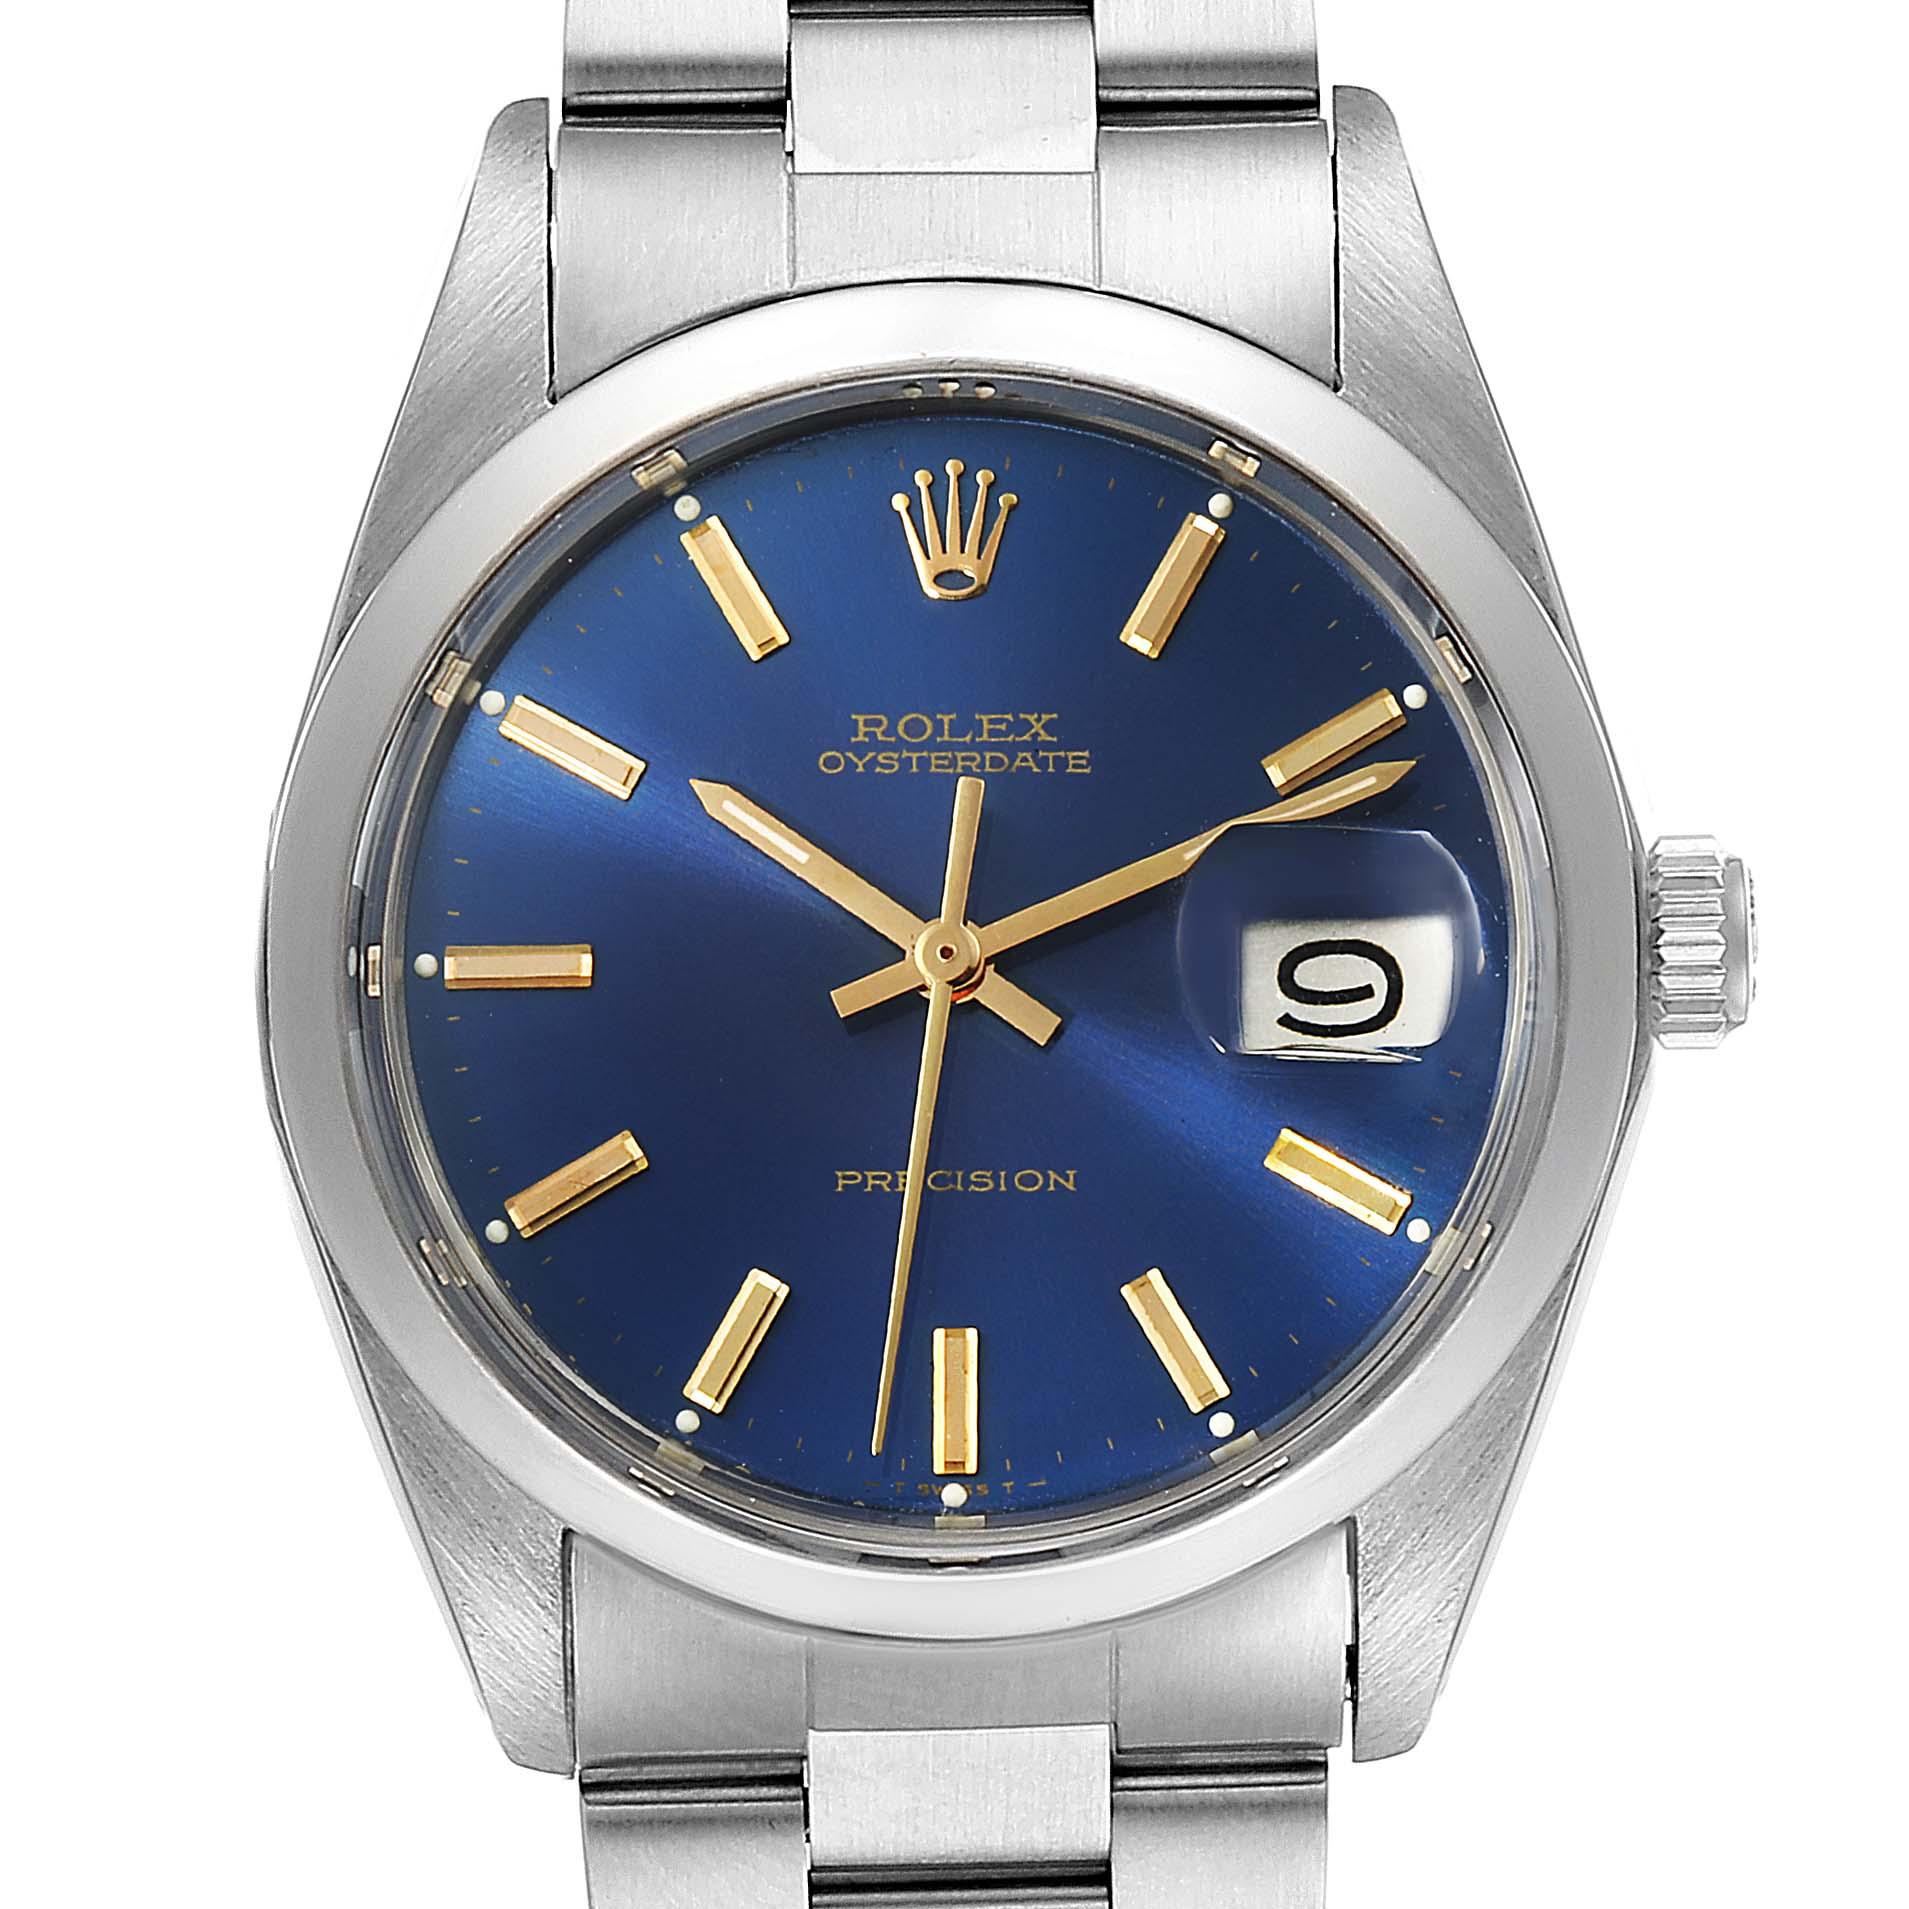 Rolex OysterDate Precision Blue Dial Steel Vintage Mens Watch 6694 SwissWatchExpo